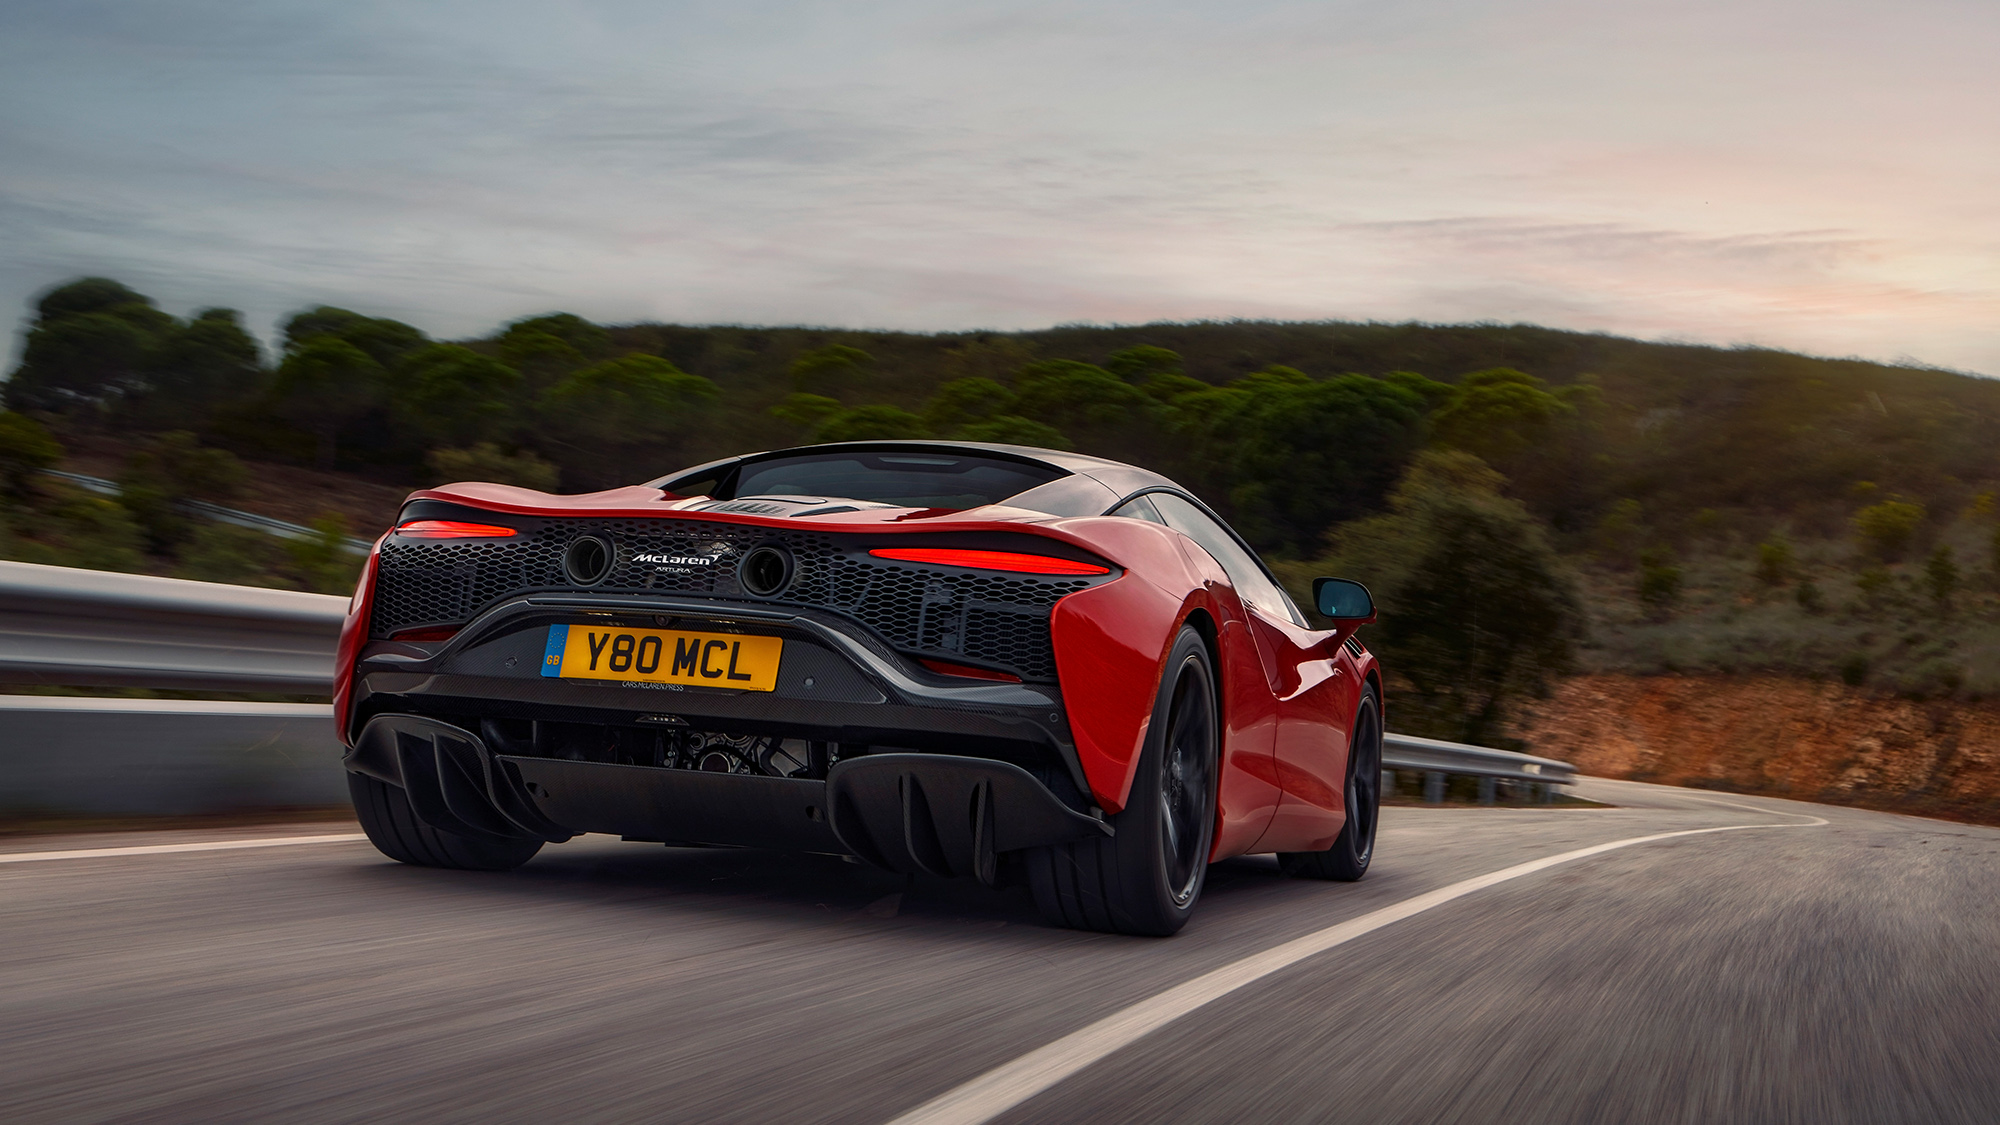 2021 McLaren Artura rear tq